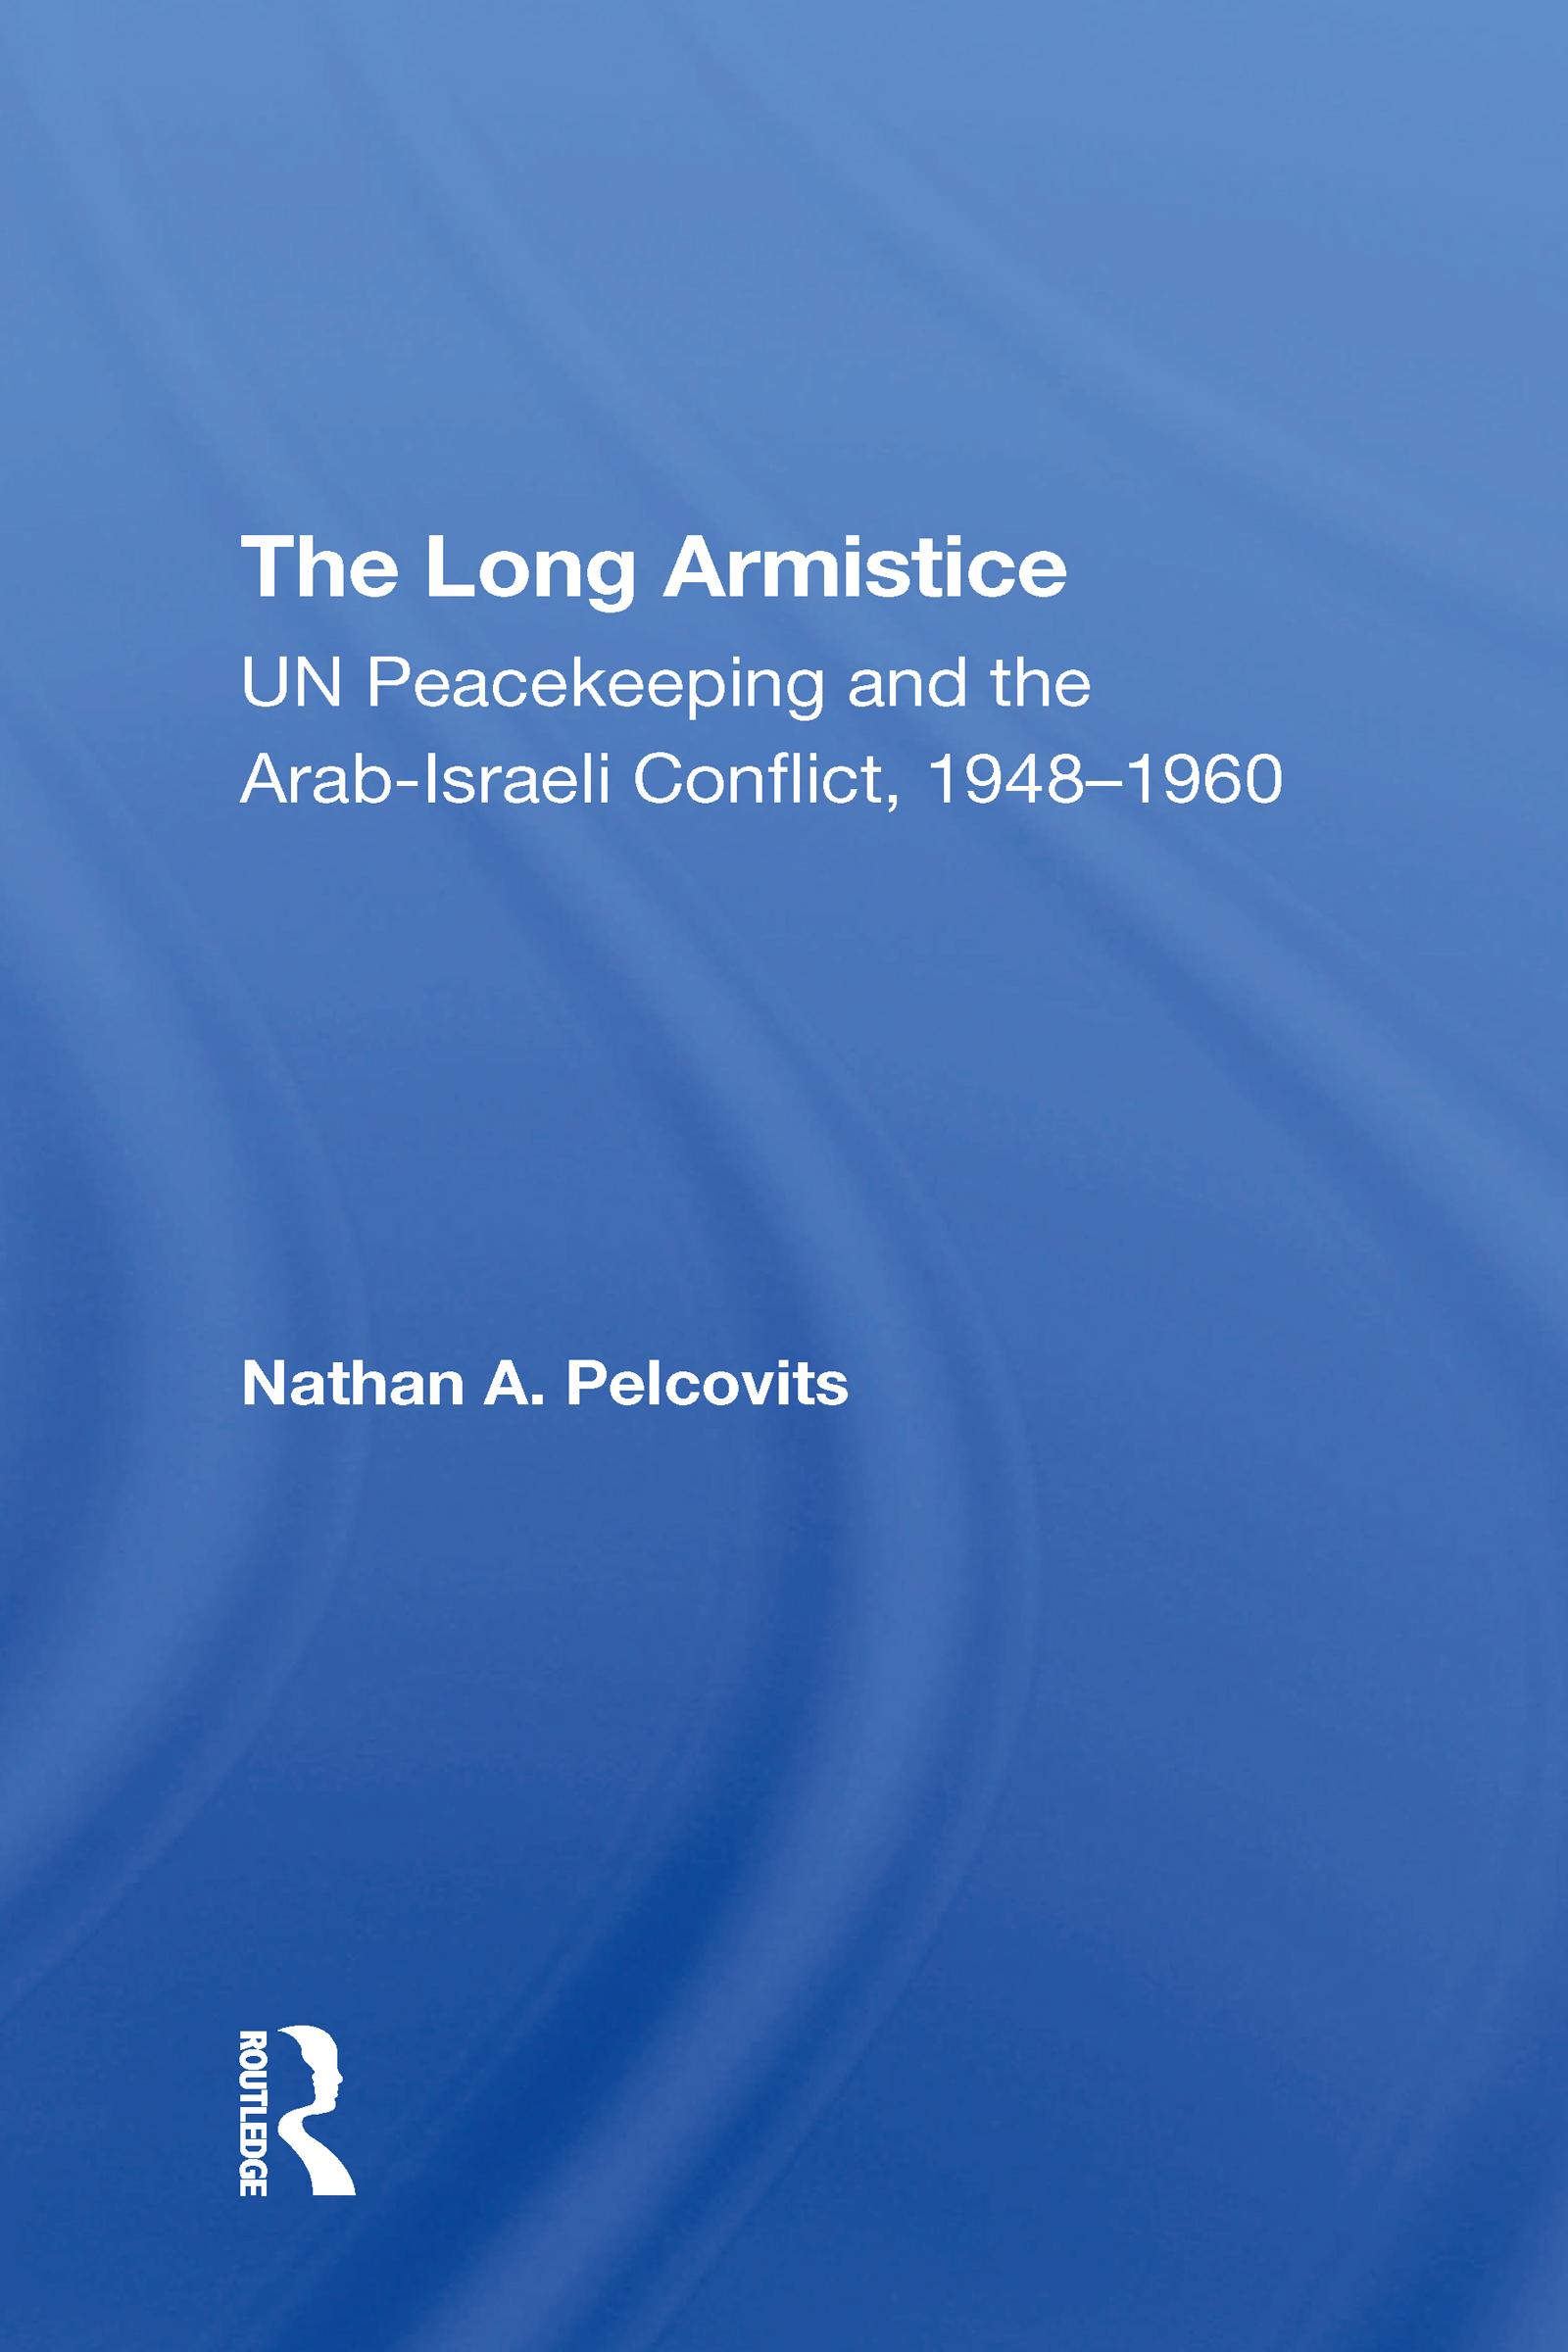 The Long Armistice